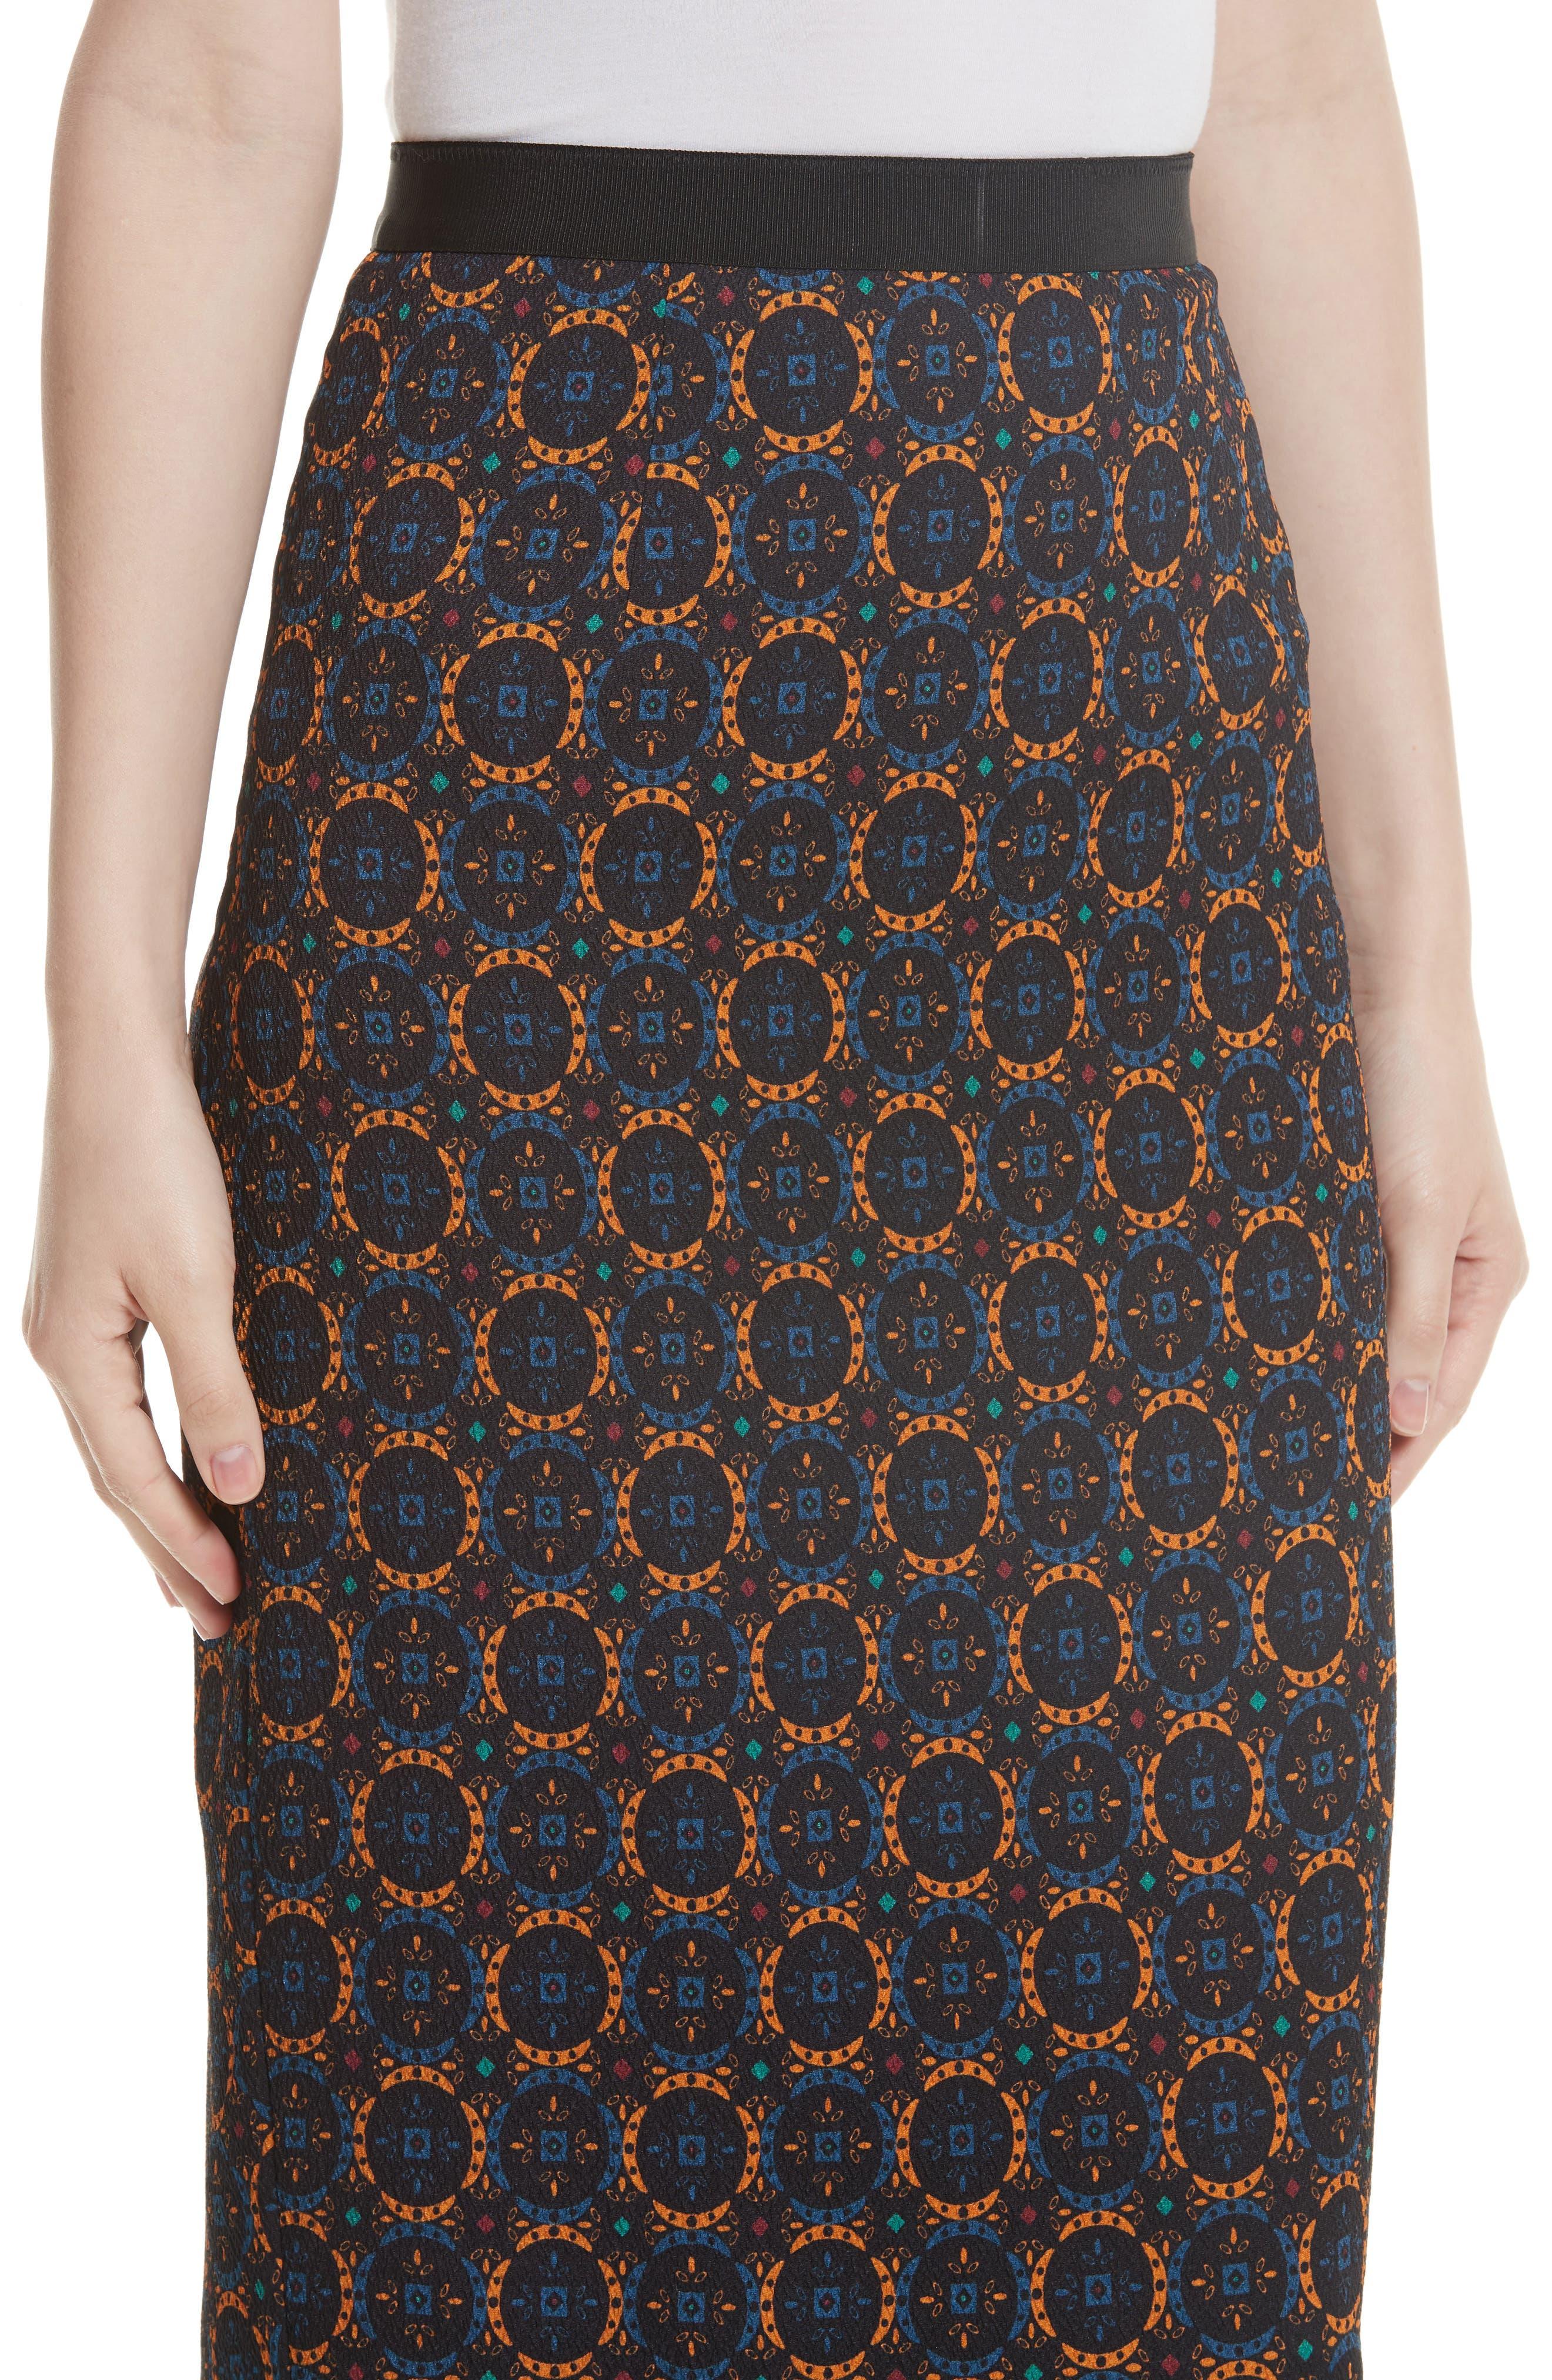 Print Stretch Silk Pencil Skirt,                             Alternate thumbnail 4, color,                             Foulard Placement